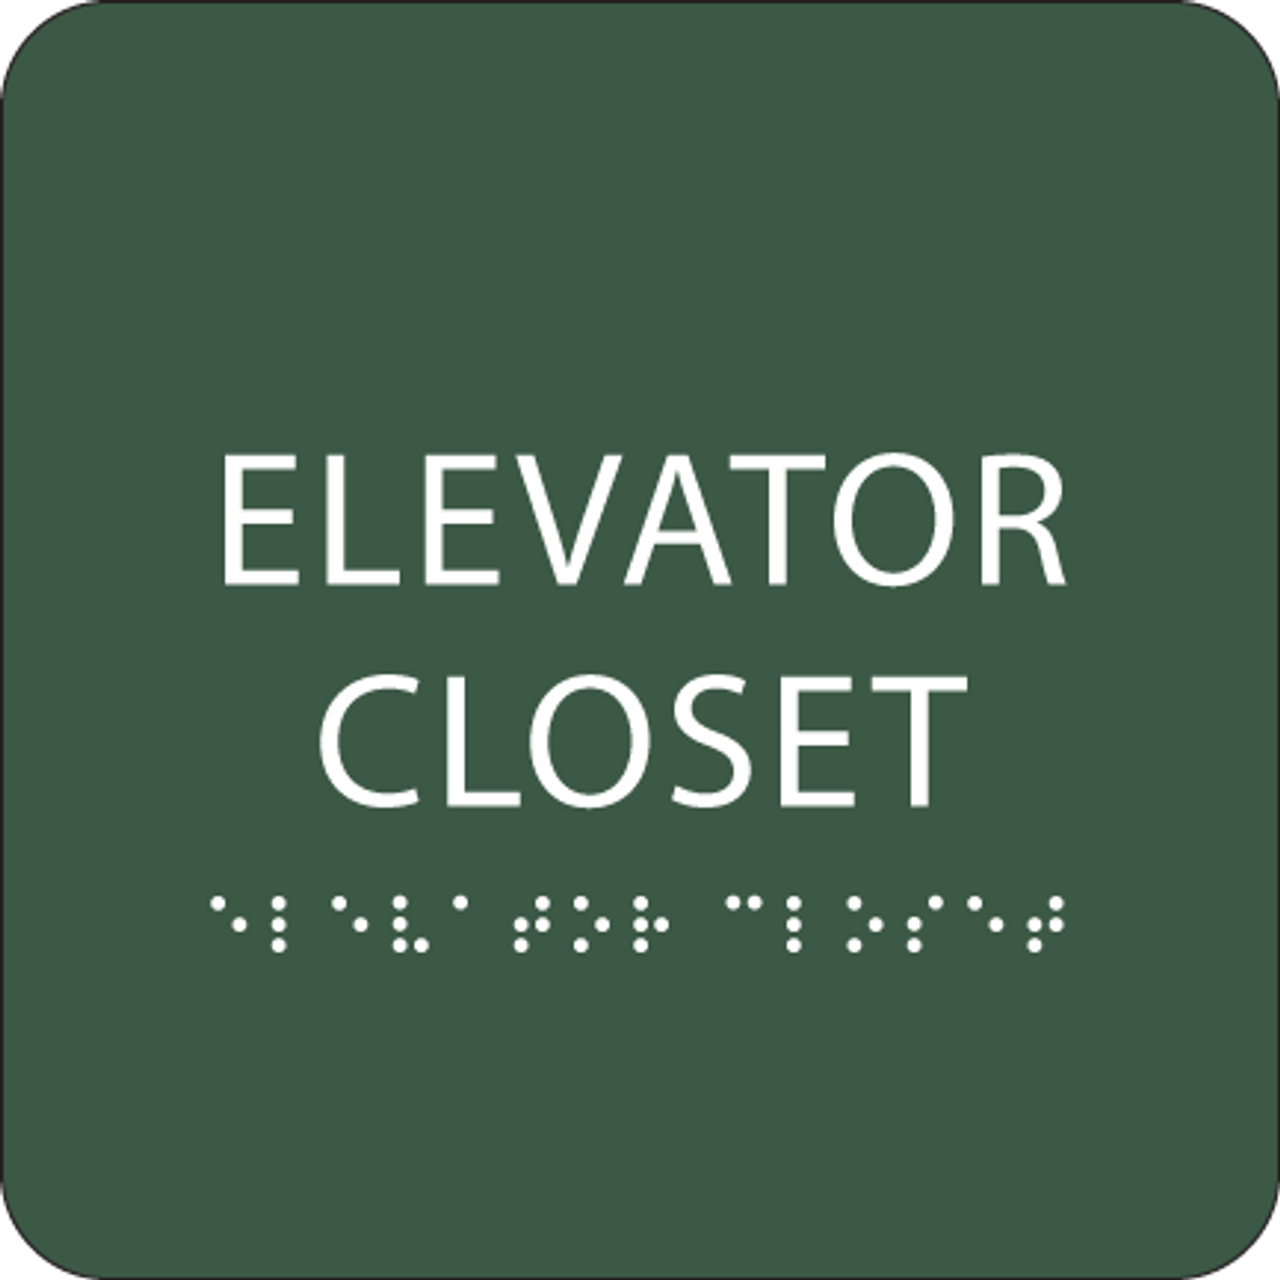 Green Tactile Elevator Closet Sign